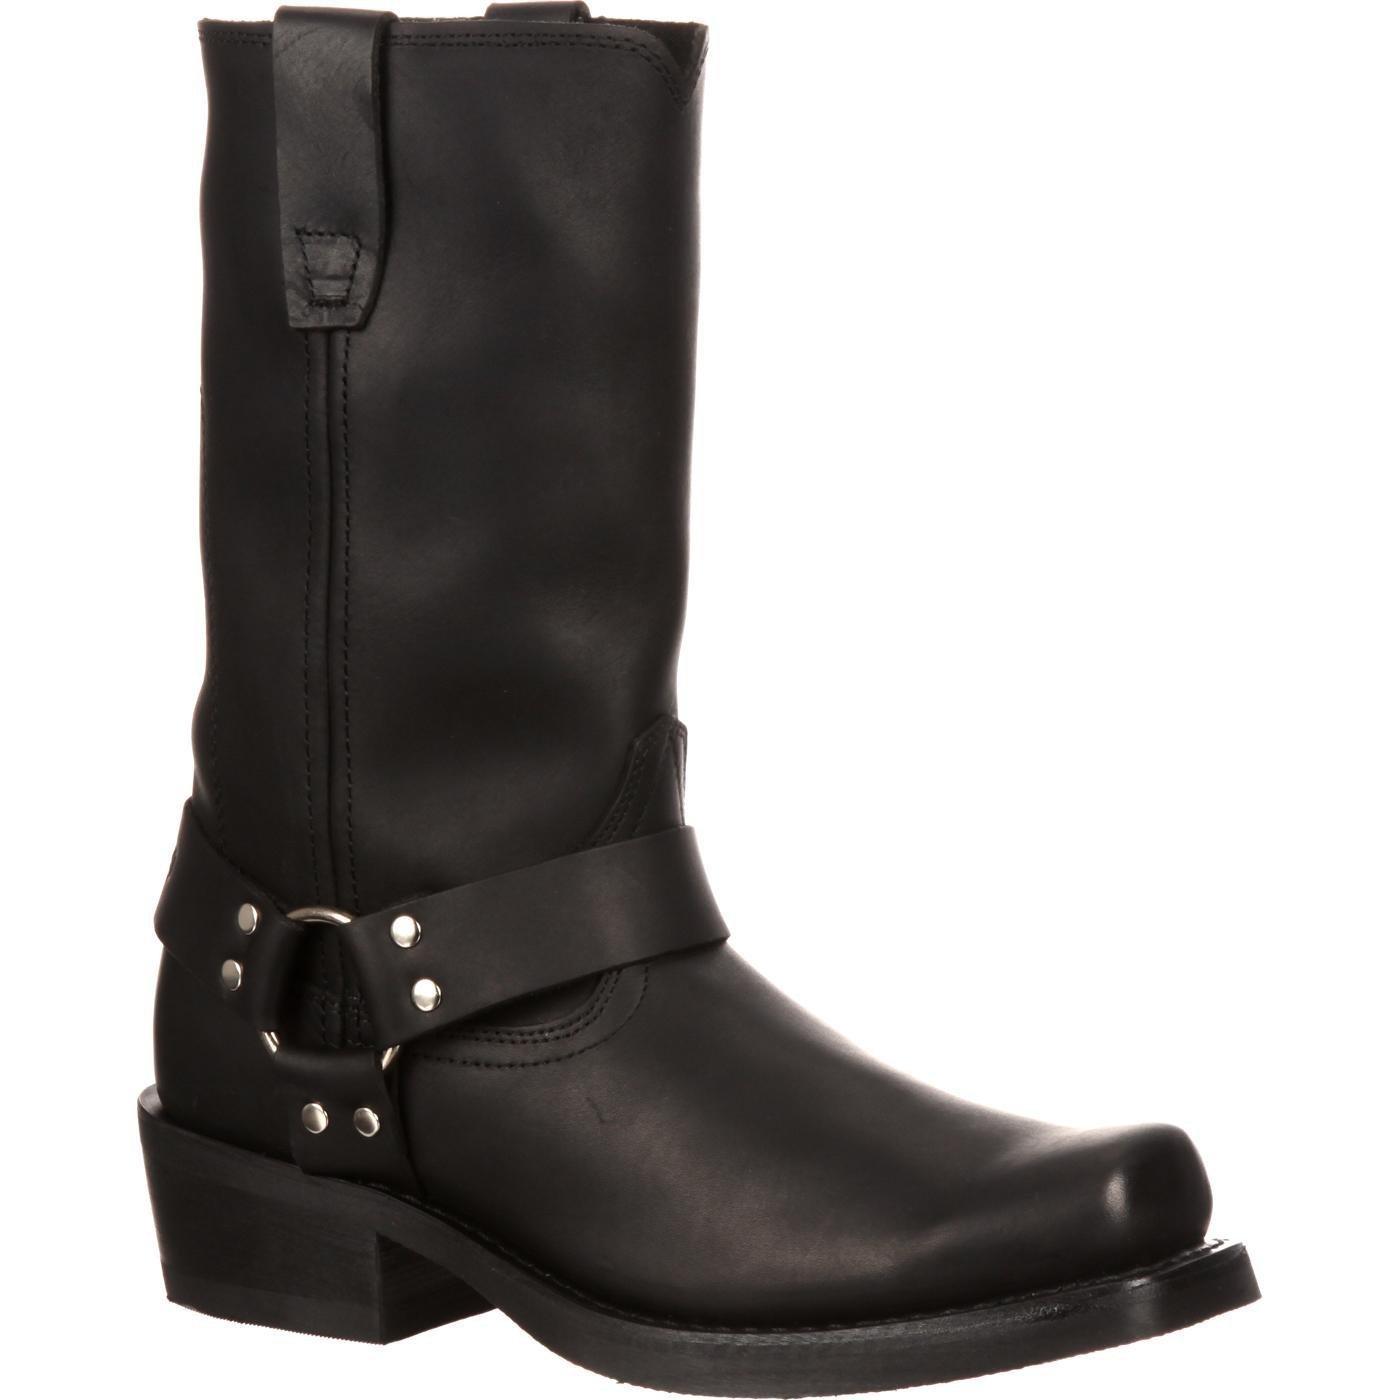 Durango Men's DB510 11'' Harness Boot Oiled Black 11 EE - Wide by Durango